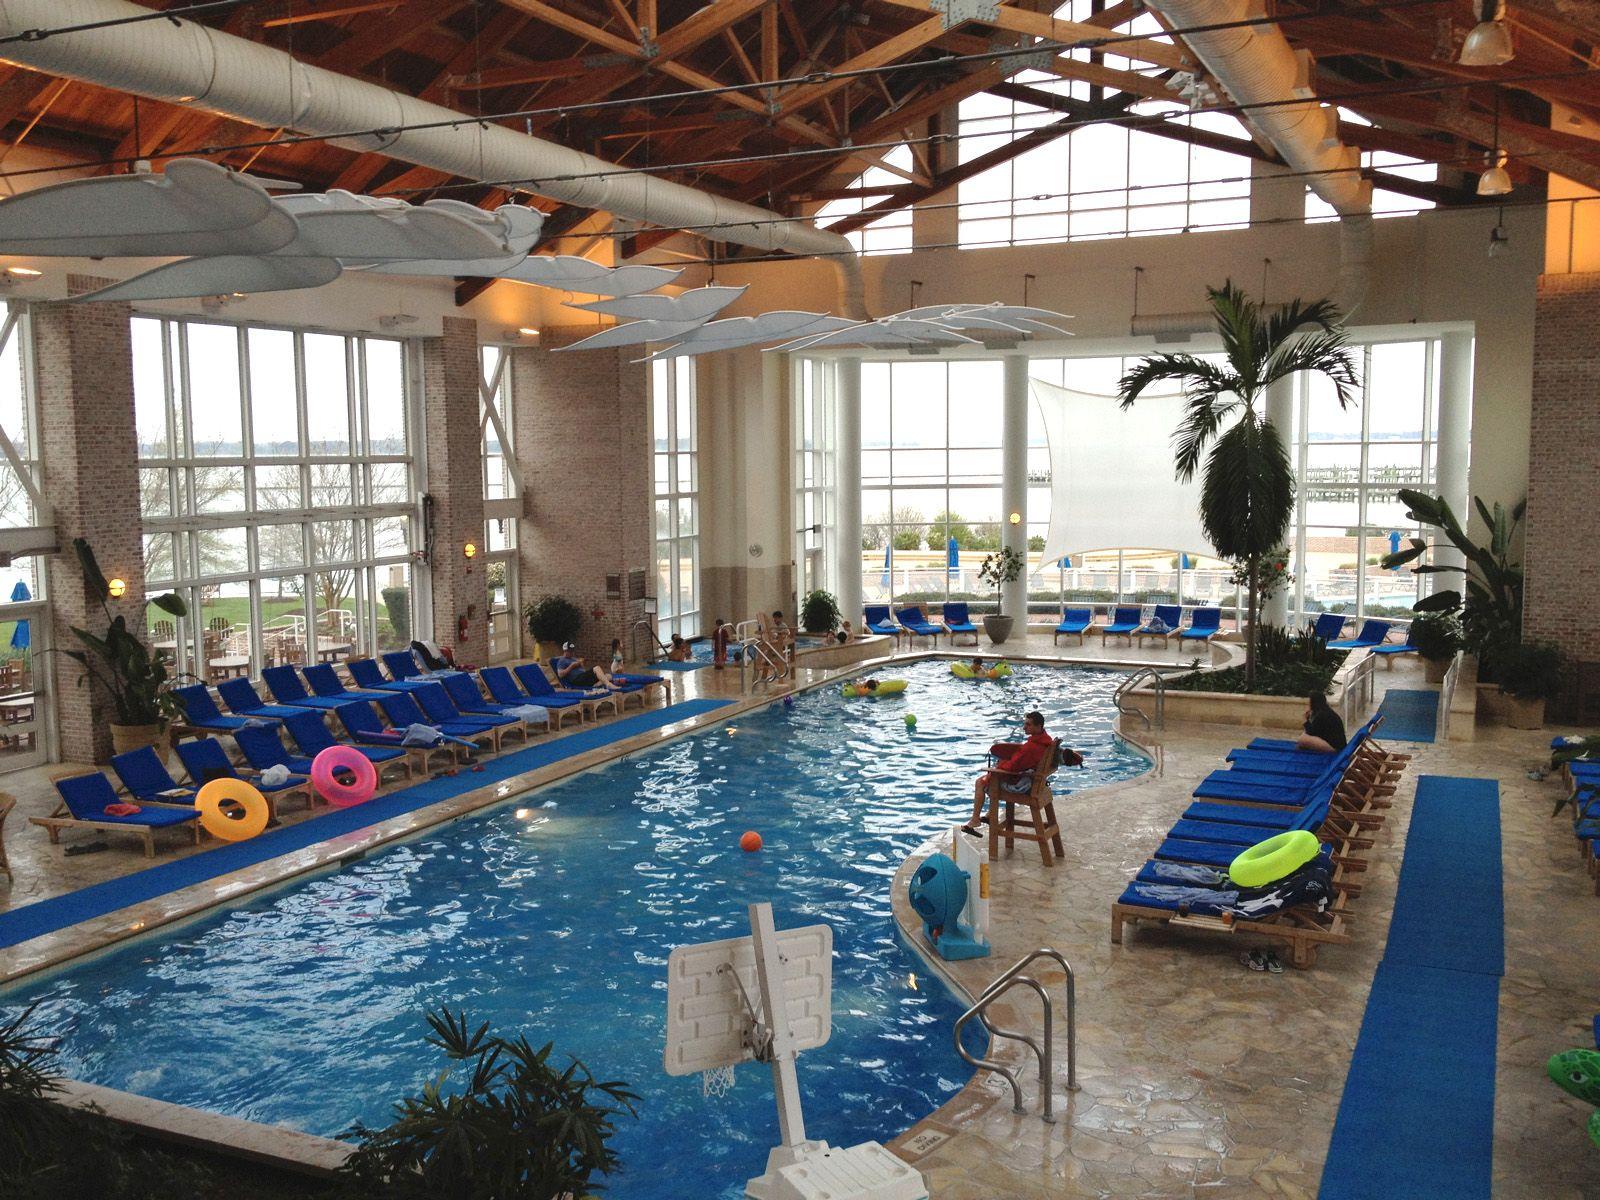 Weekend Getaway At The Hyatt Chesapeake Bay Golf Resort And Spa In Cambridge Md